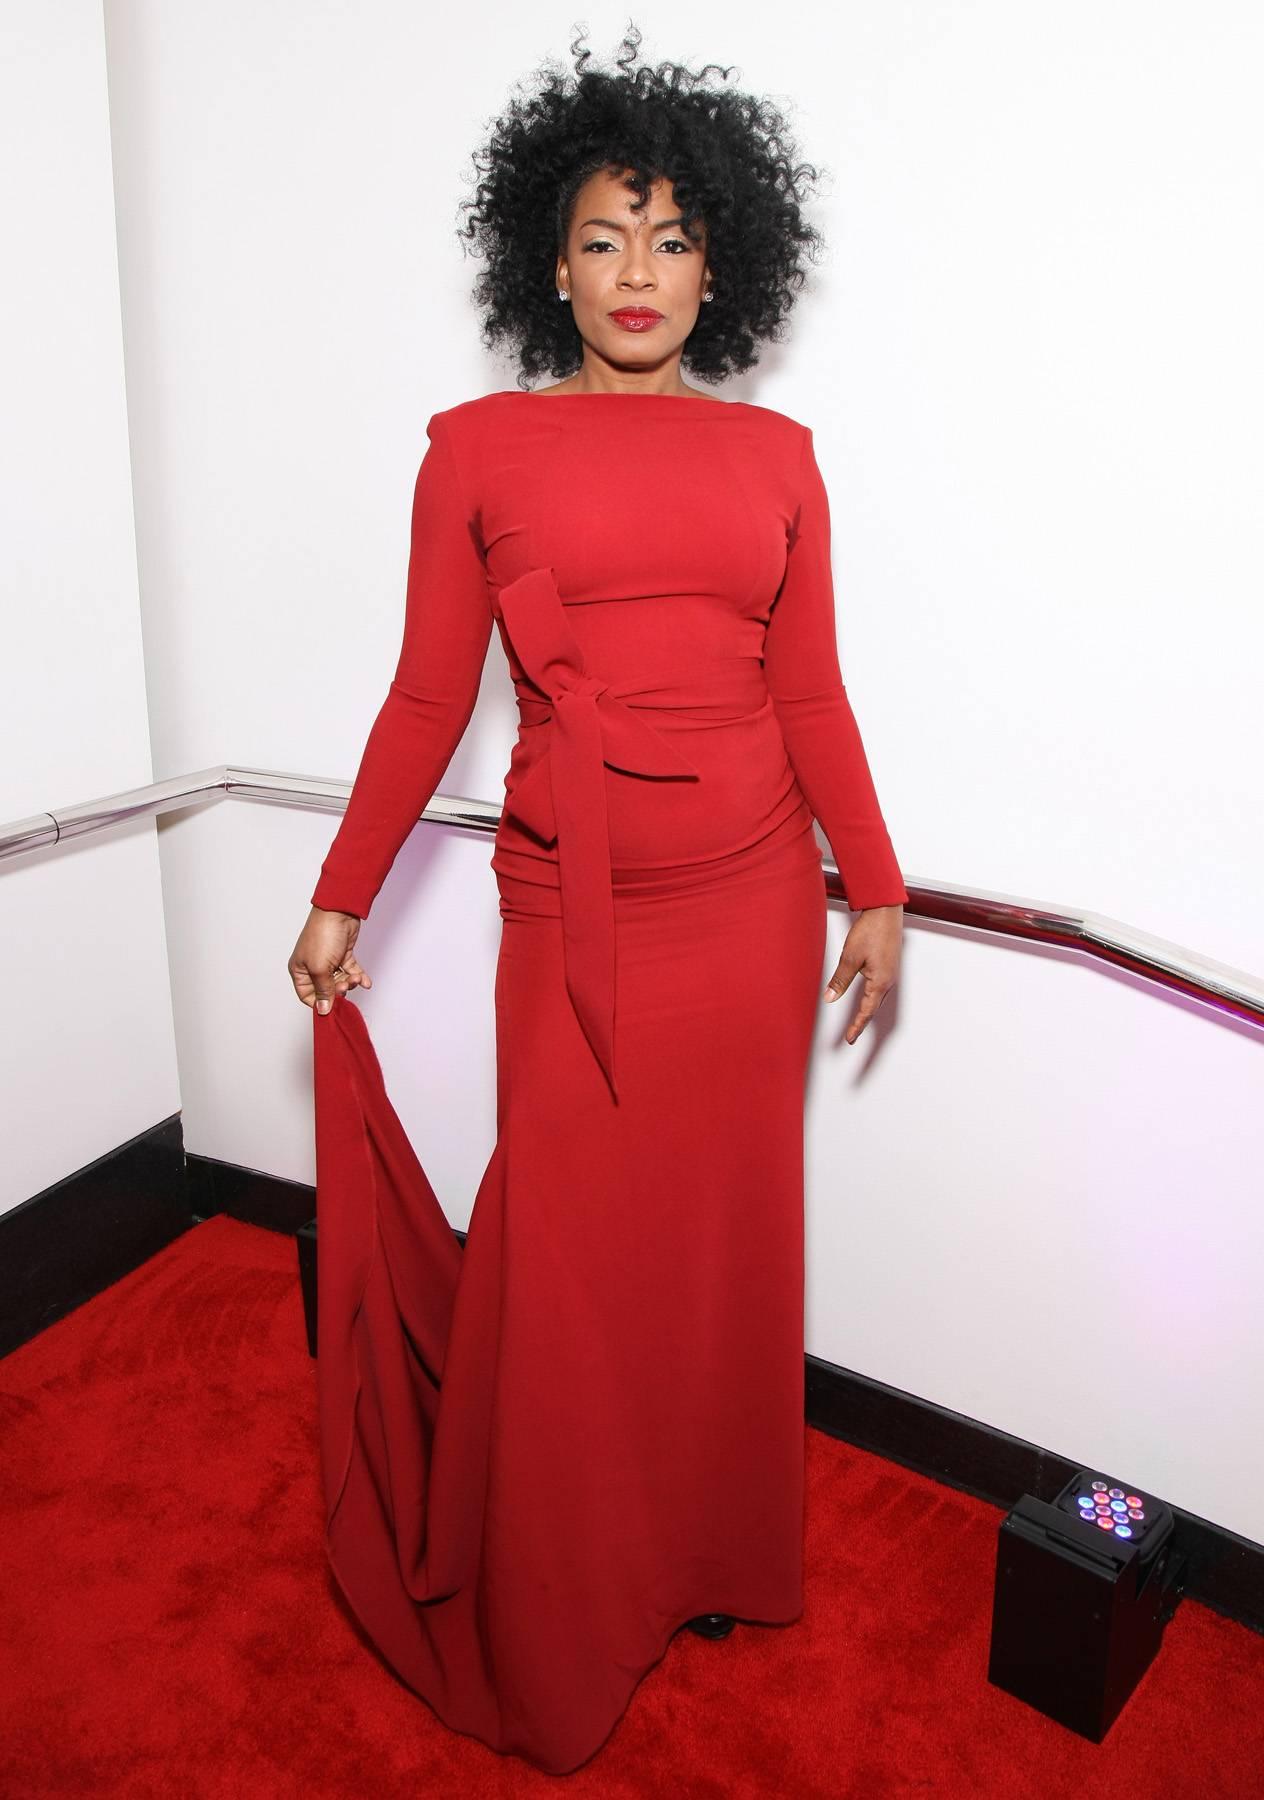 Killer Red  - Aunjanue Ellis is a killer in her red dress! (Photo by Bennett Raglin/BET/Getty Images for BET)